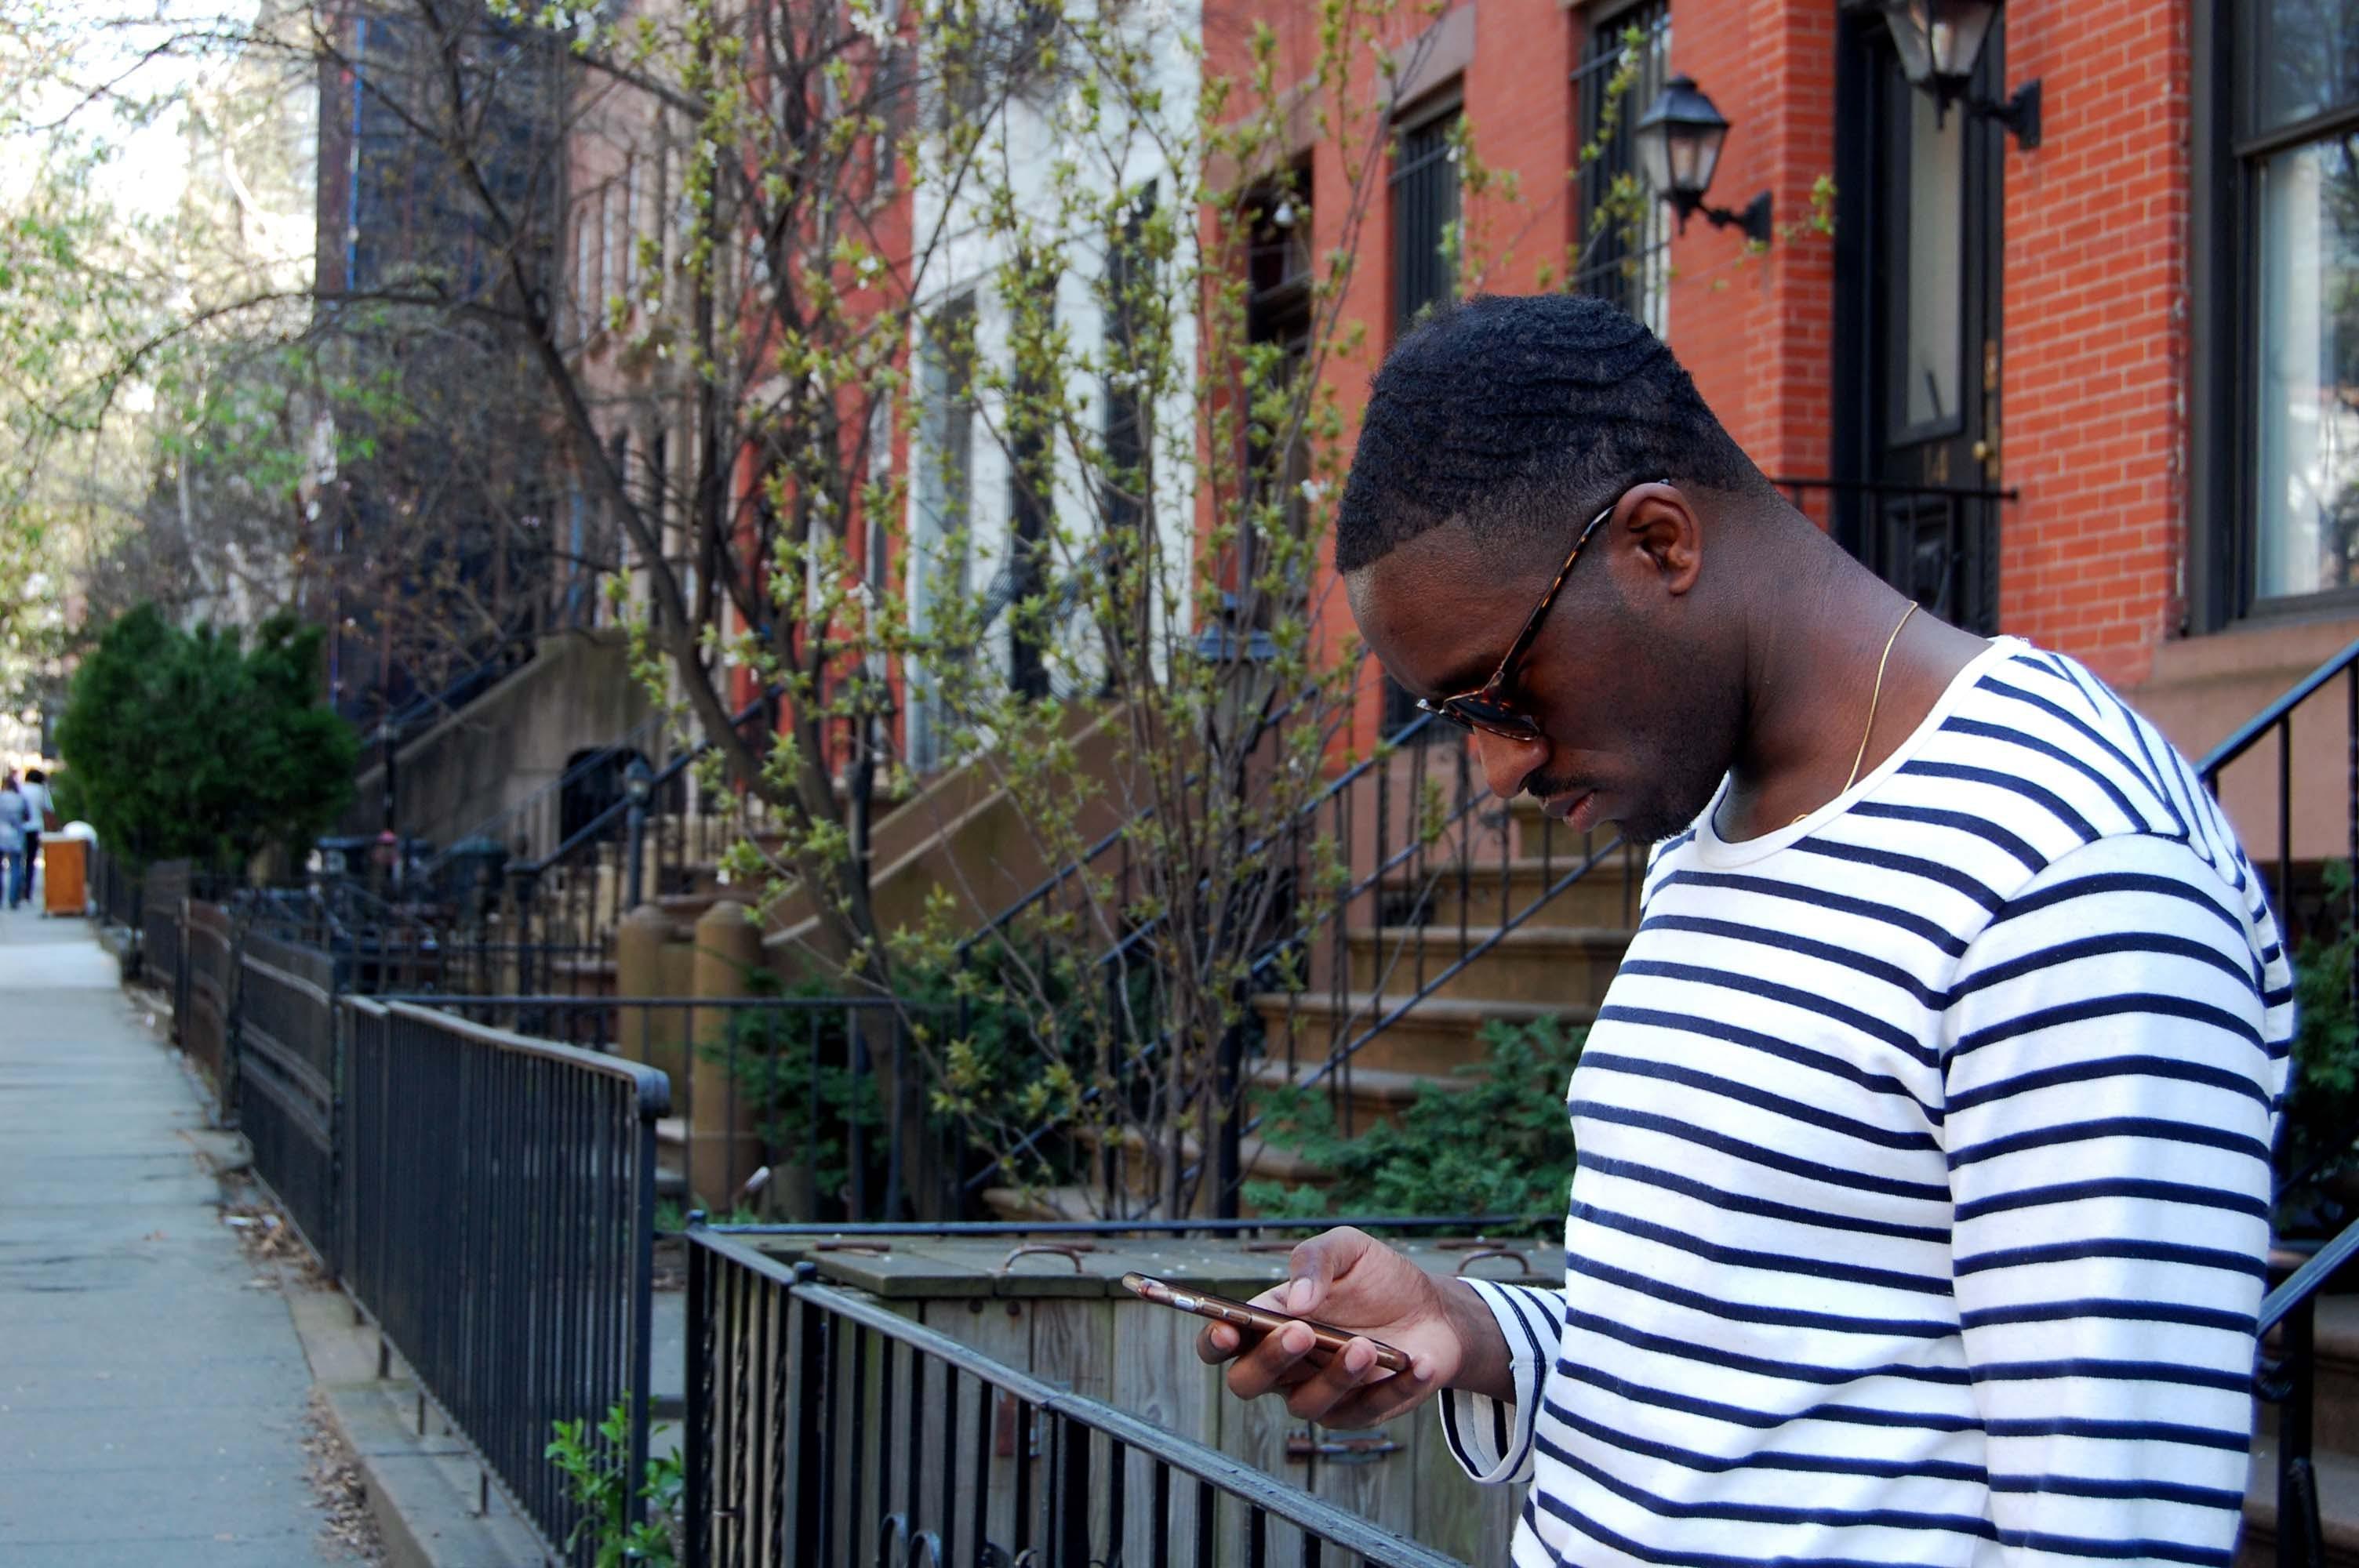 Men's White and Black Striped Long-sleeved Shirt